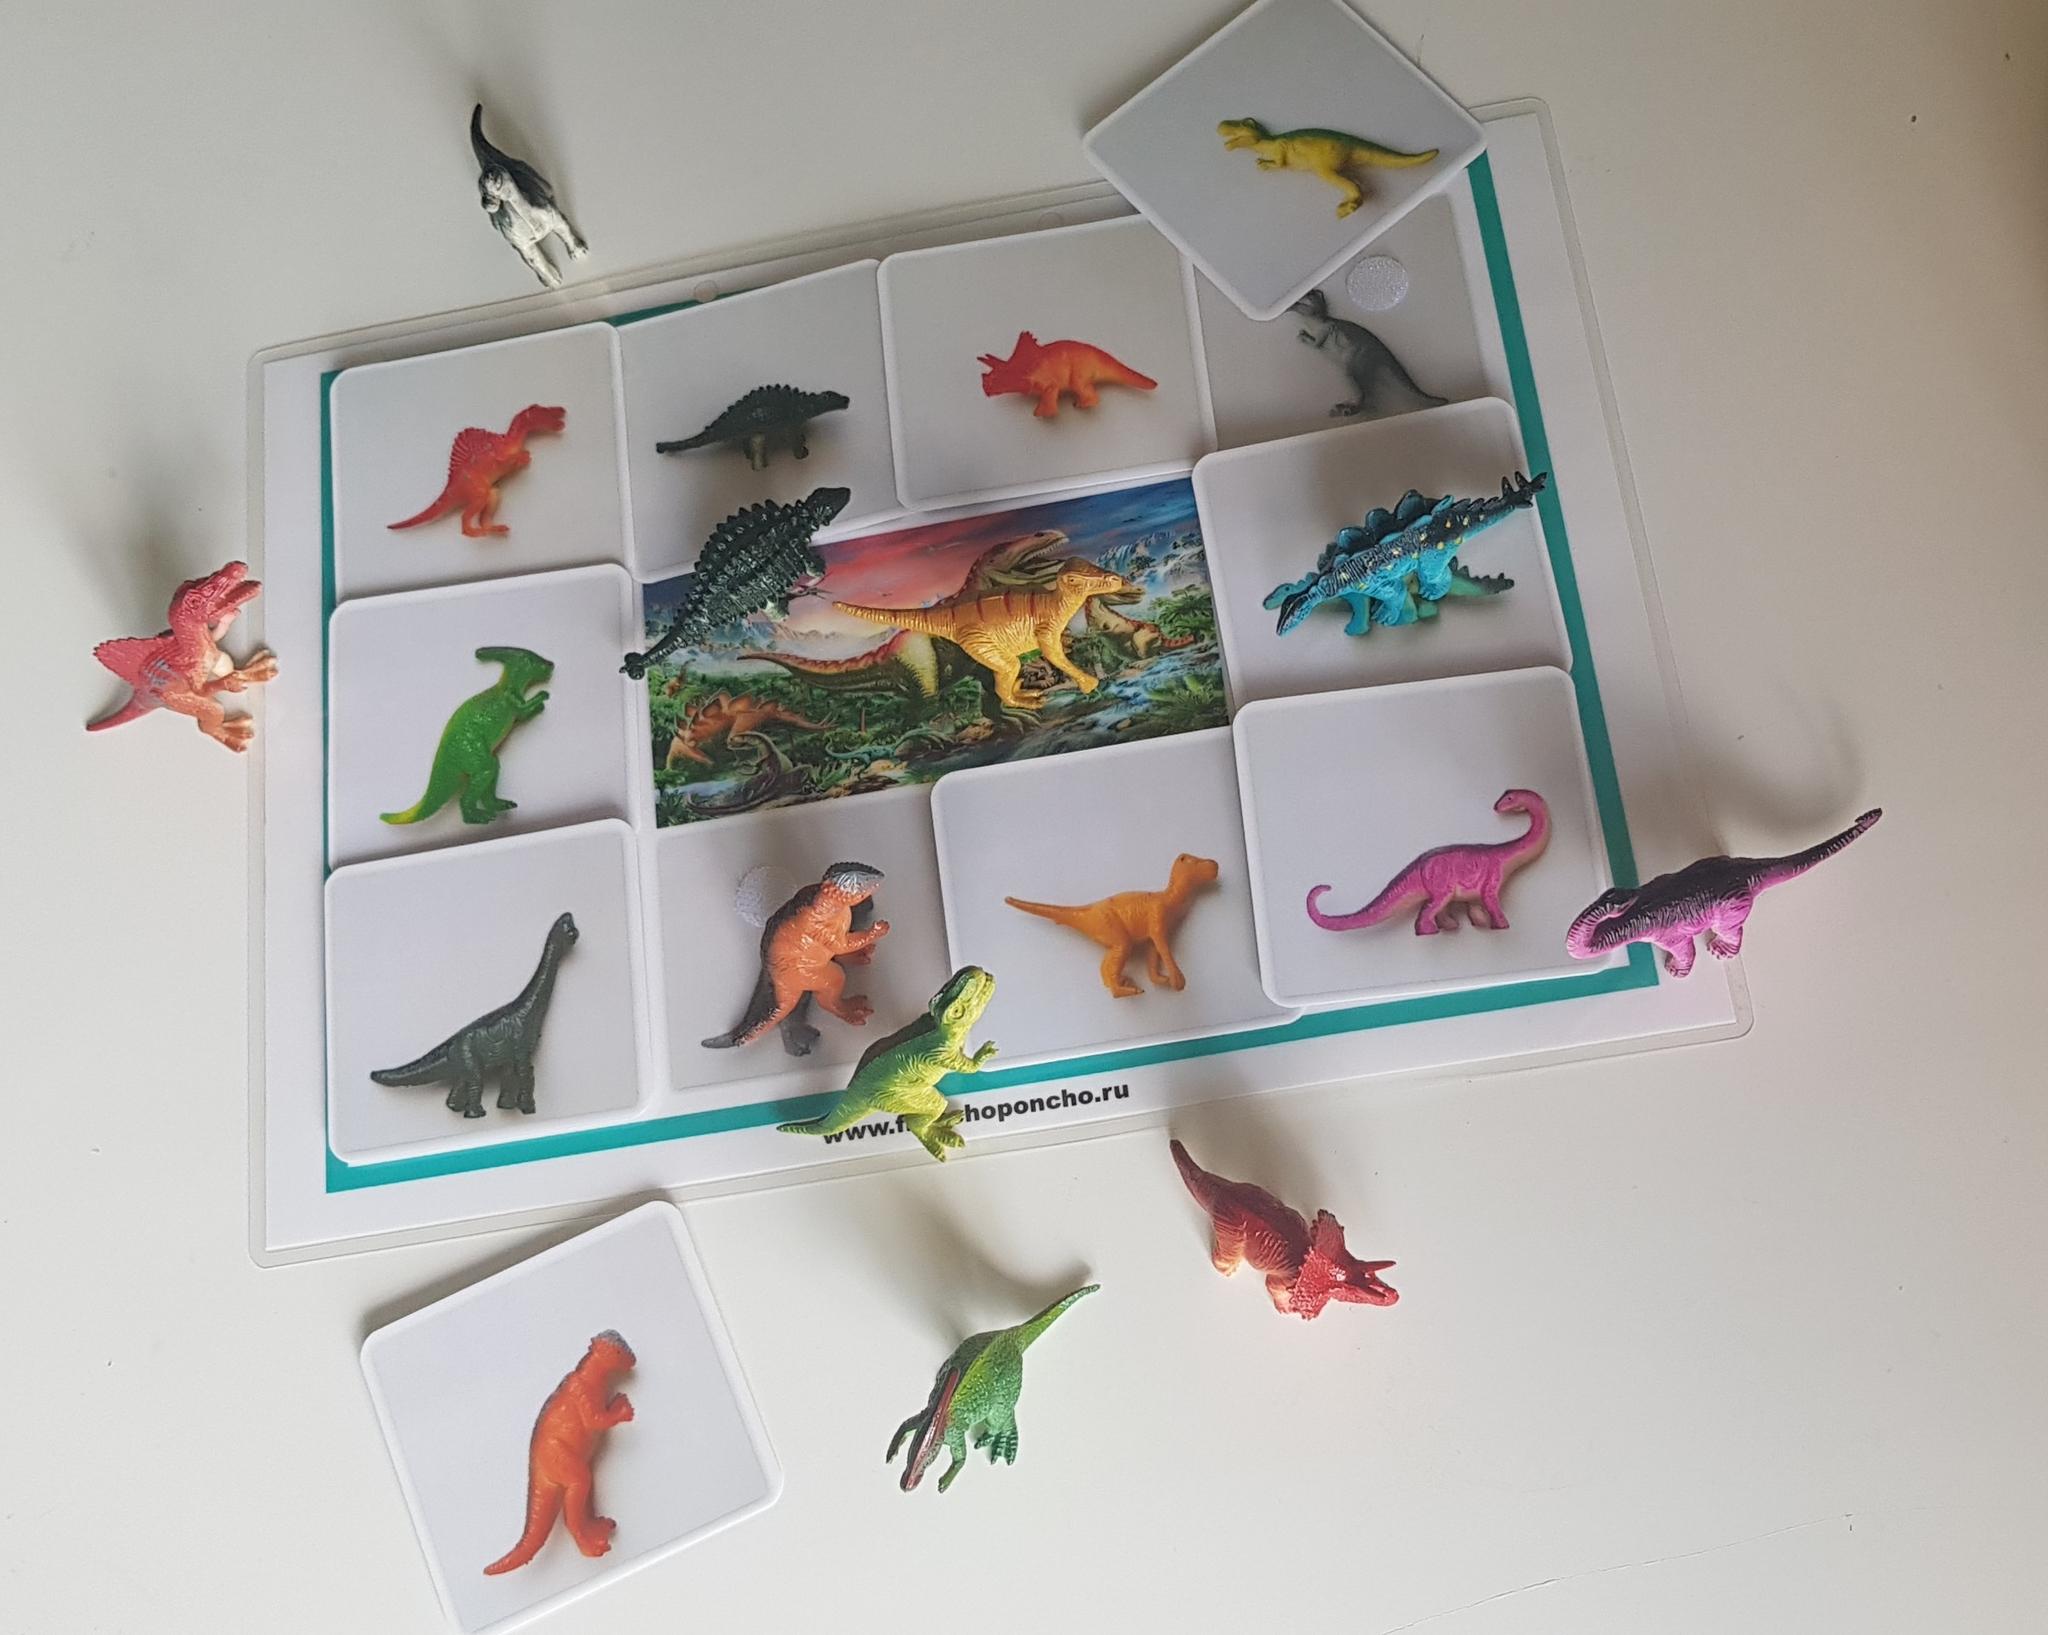 Теневое лото Динозавры с фигурками. Развивающее пособие на липучках Frenchoponcho (Френчопончо)